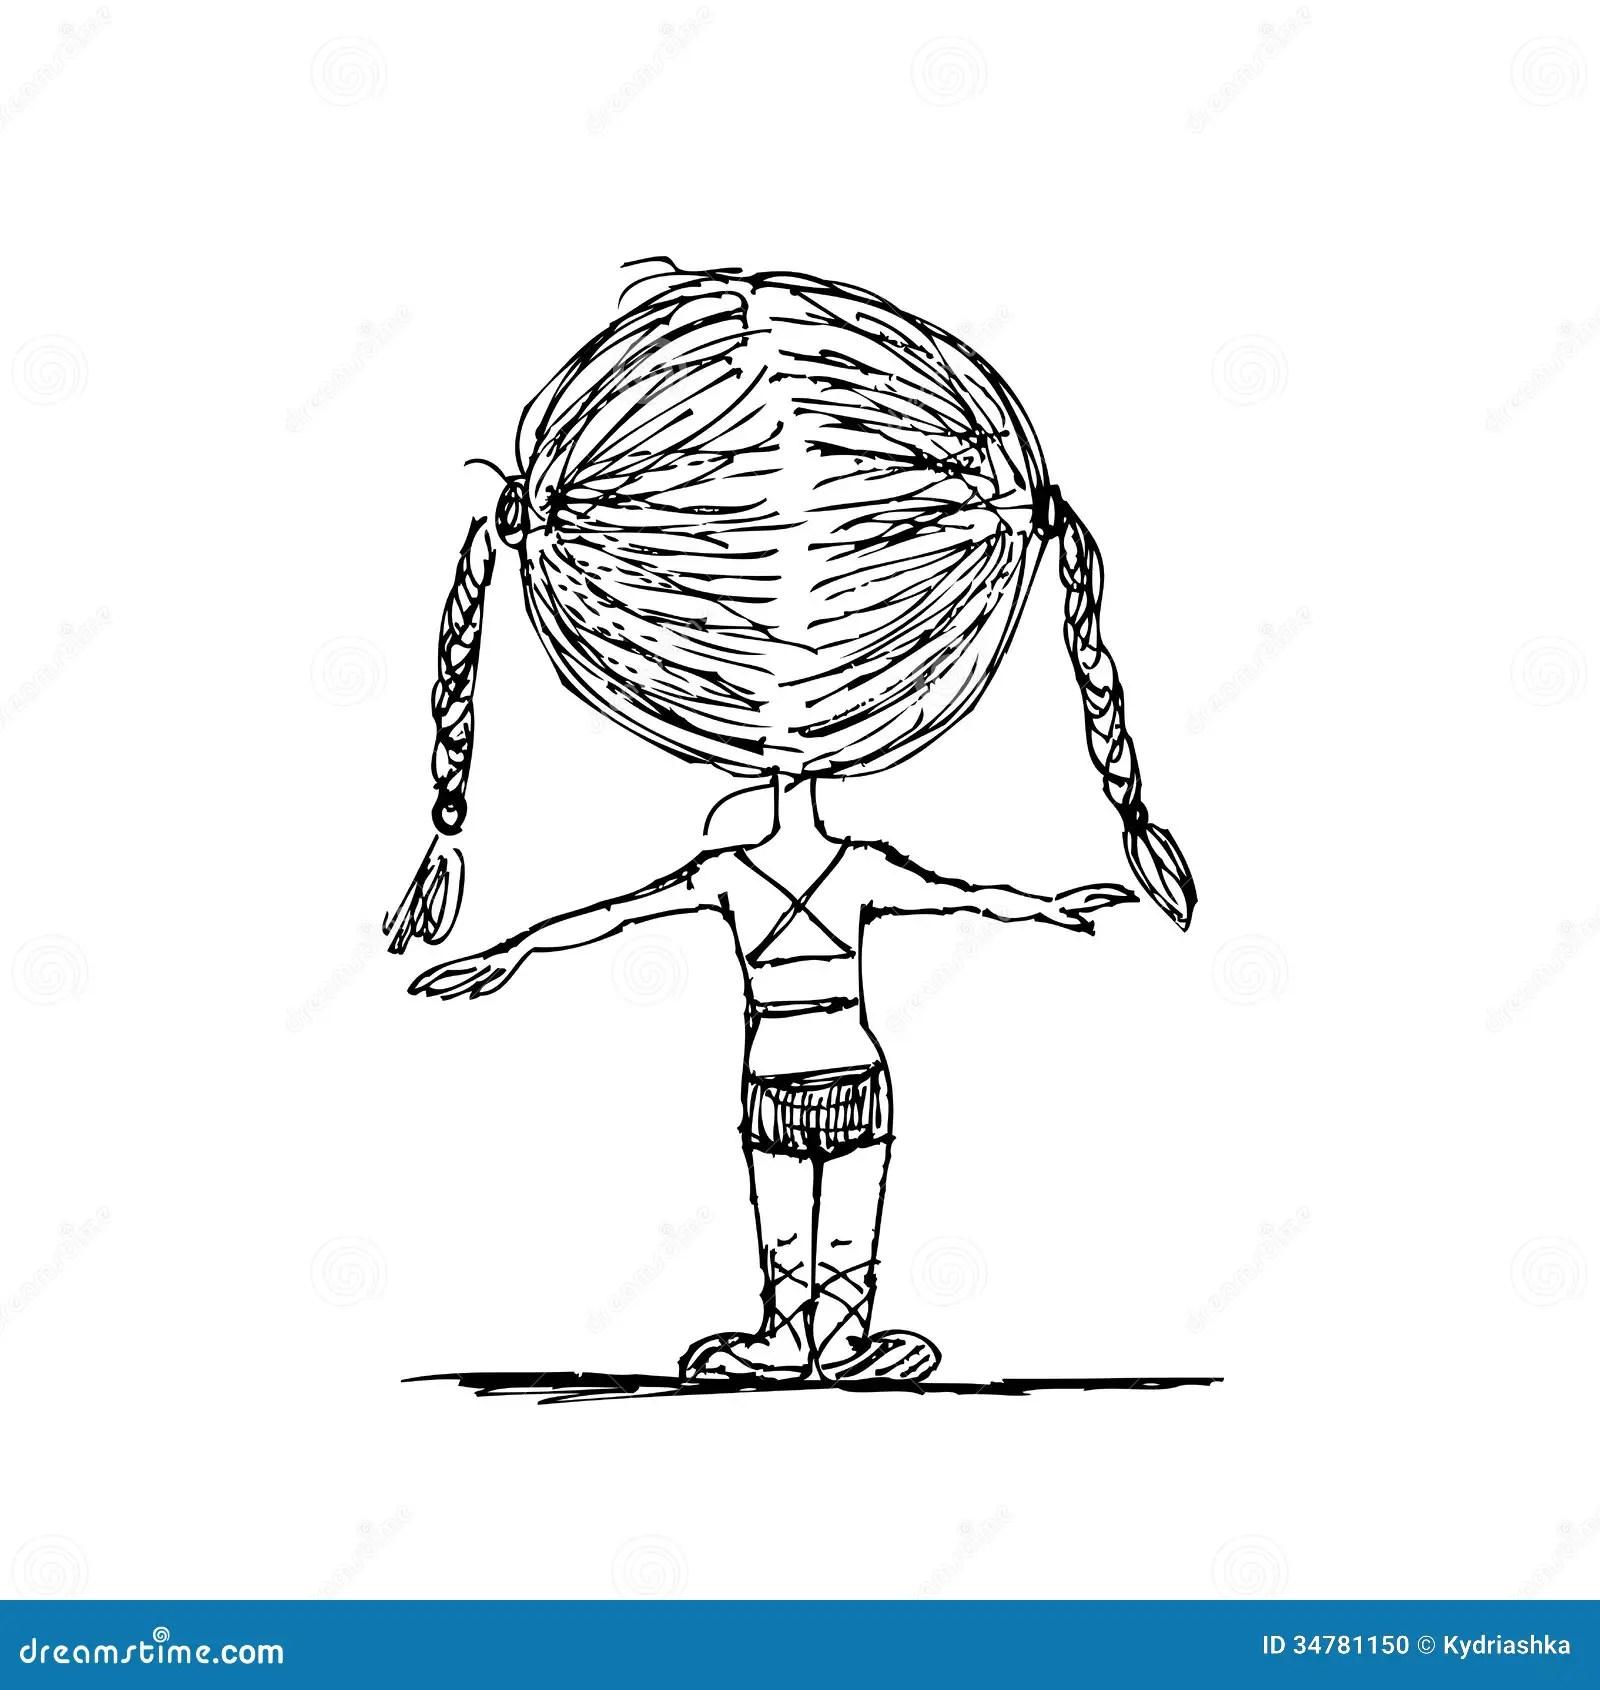 Girl Doing Gymnastics Sketch For Your Design Stock Photo